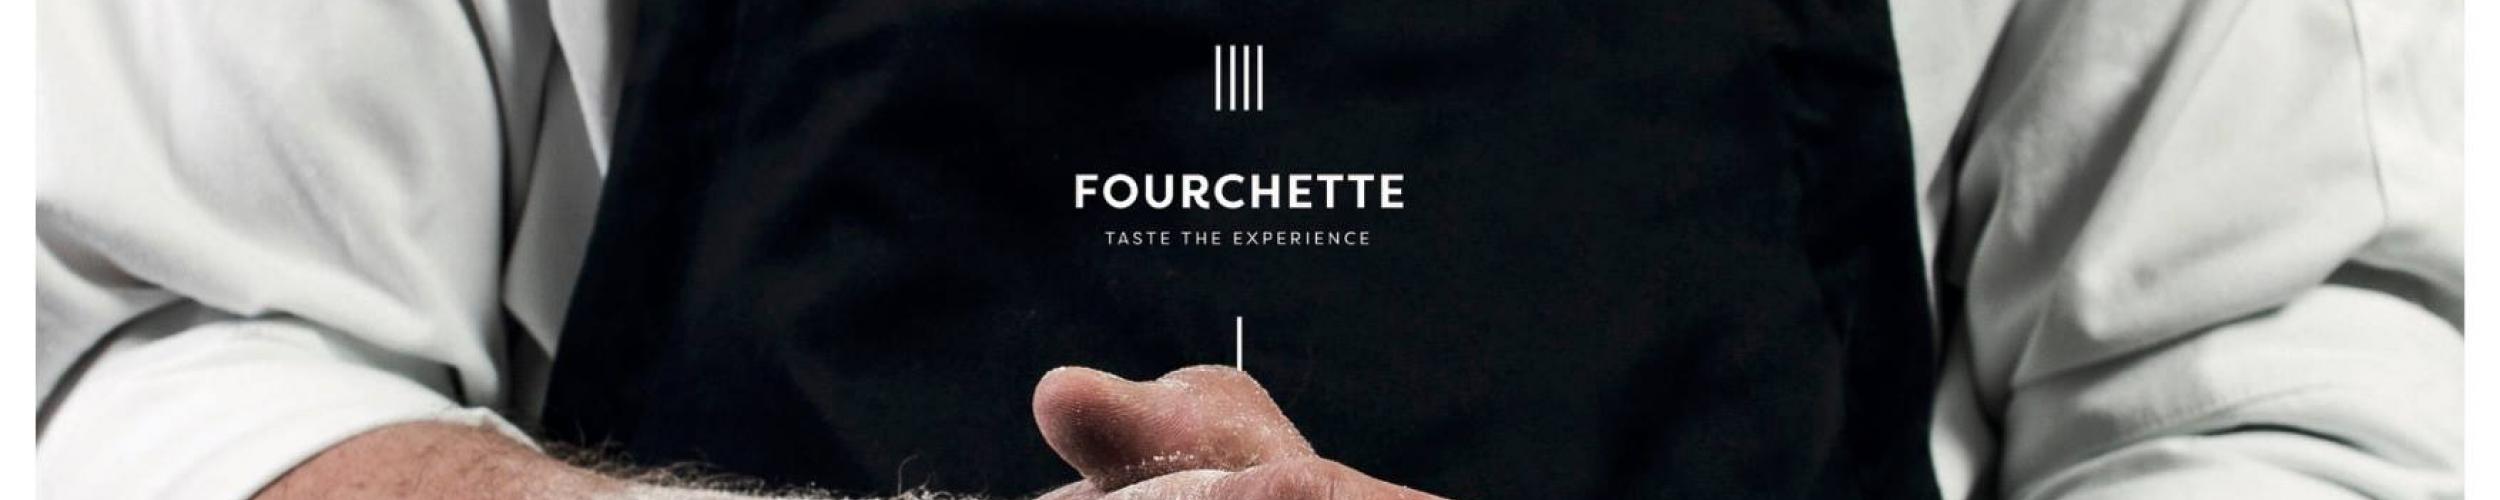 Fourchette: 15, 16, 17 maart 2019